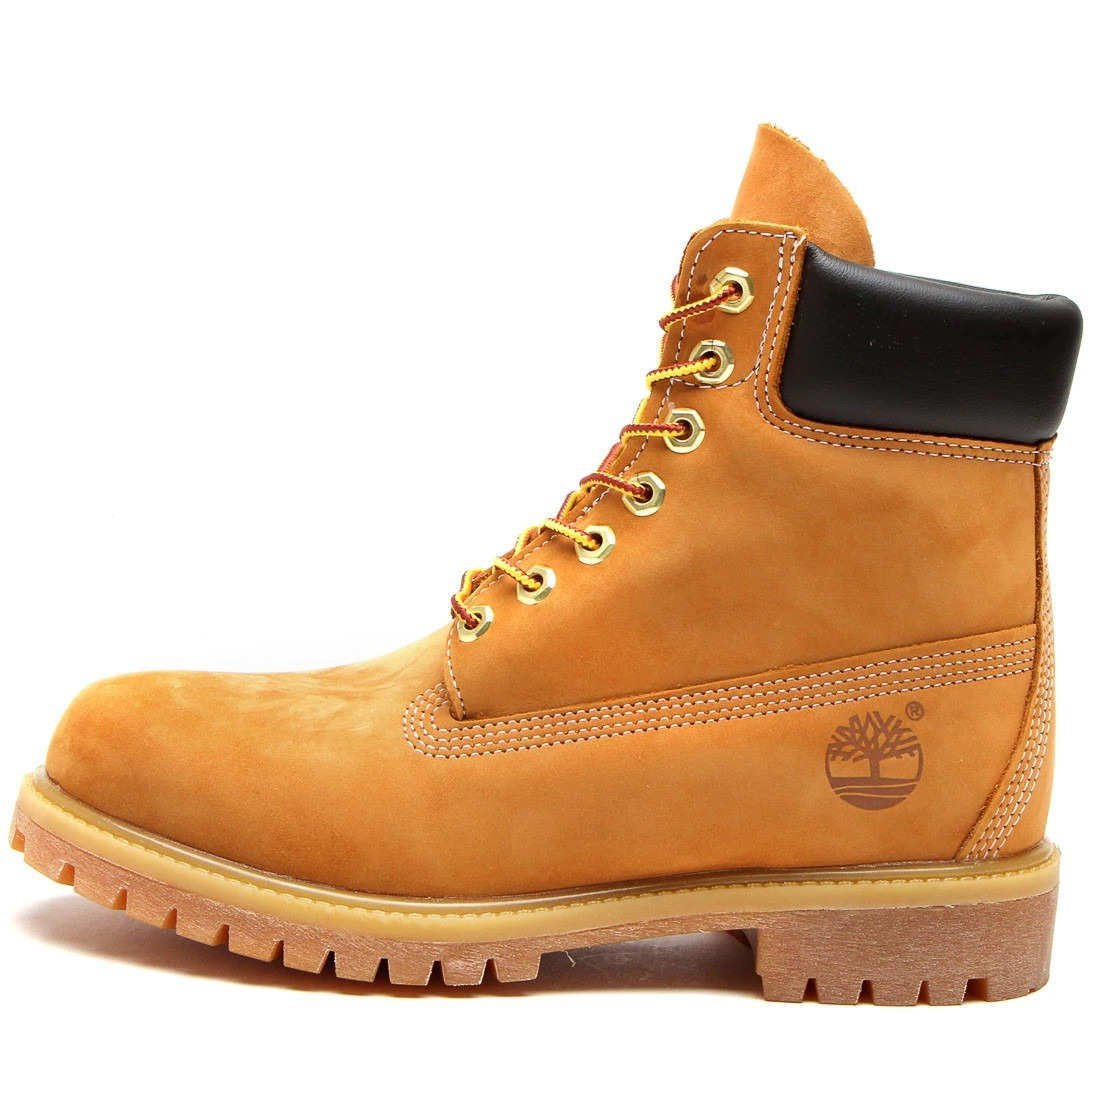 d1b2a0b32 bota timberland yellow boot 6 premium wp. Carregando zoom.